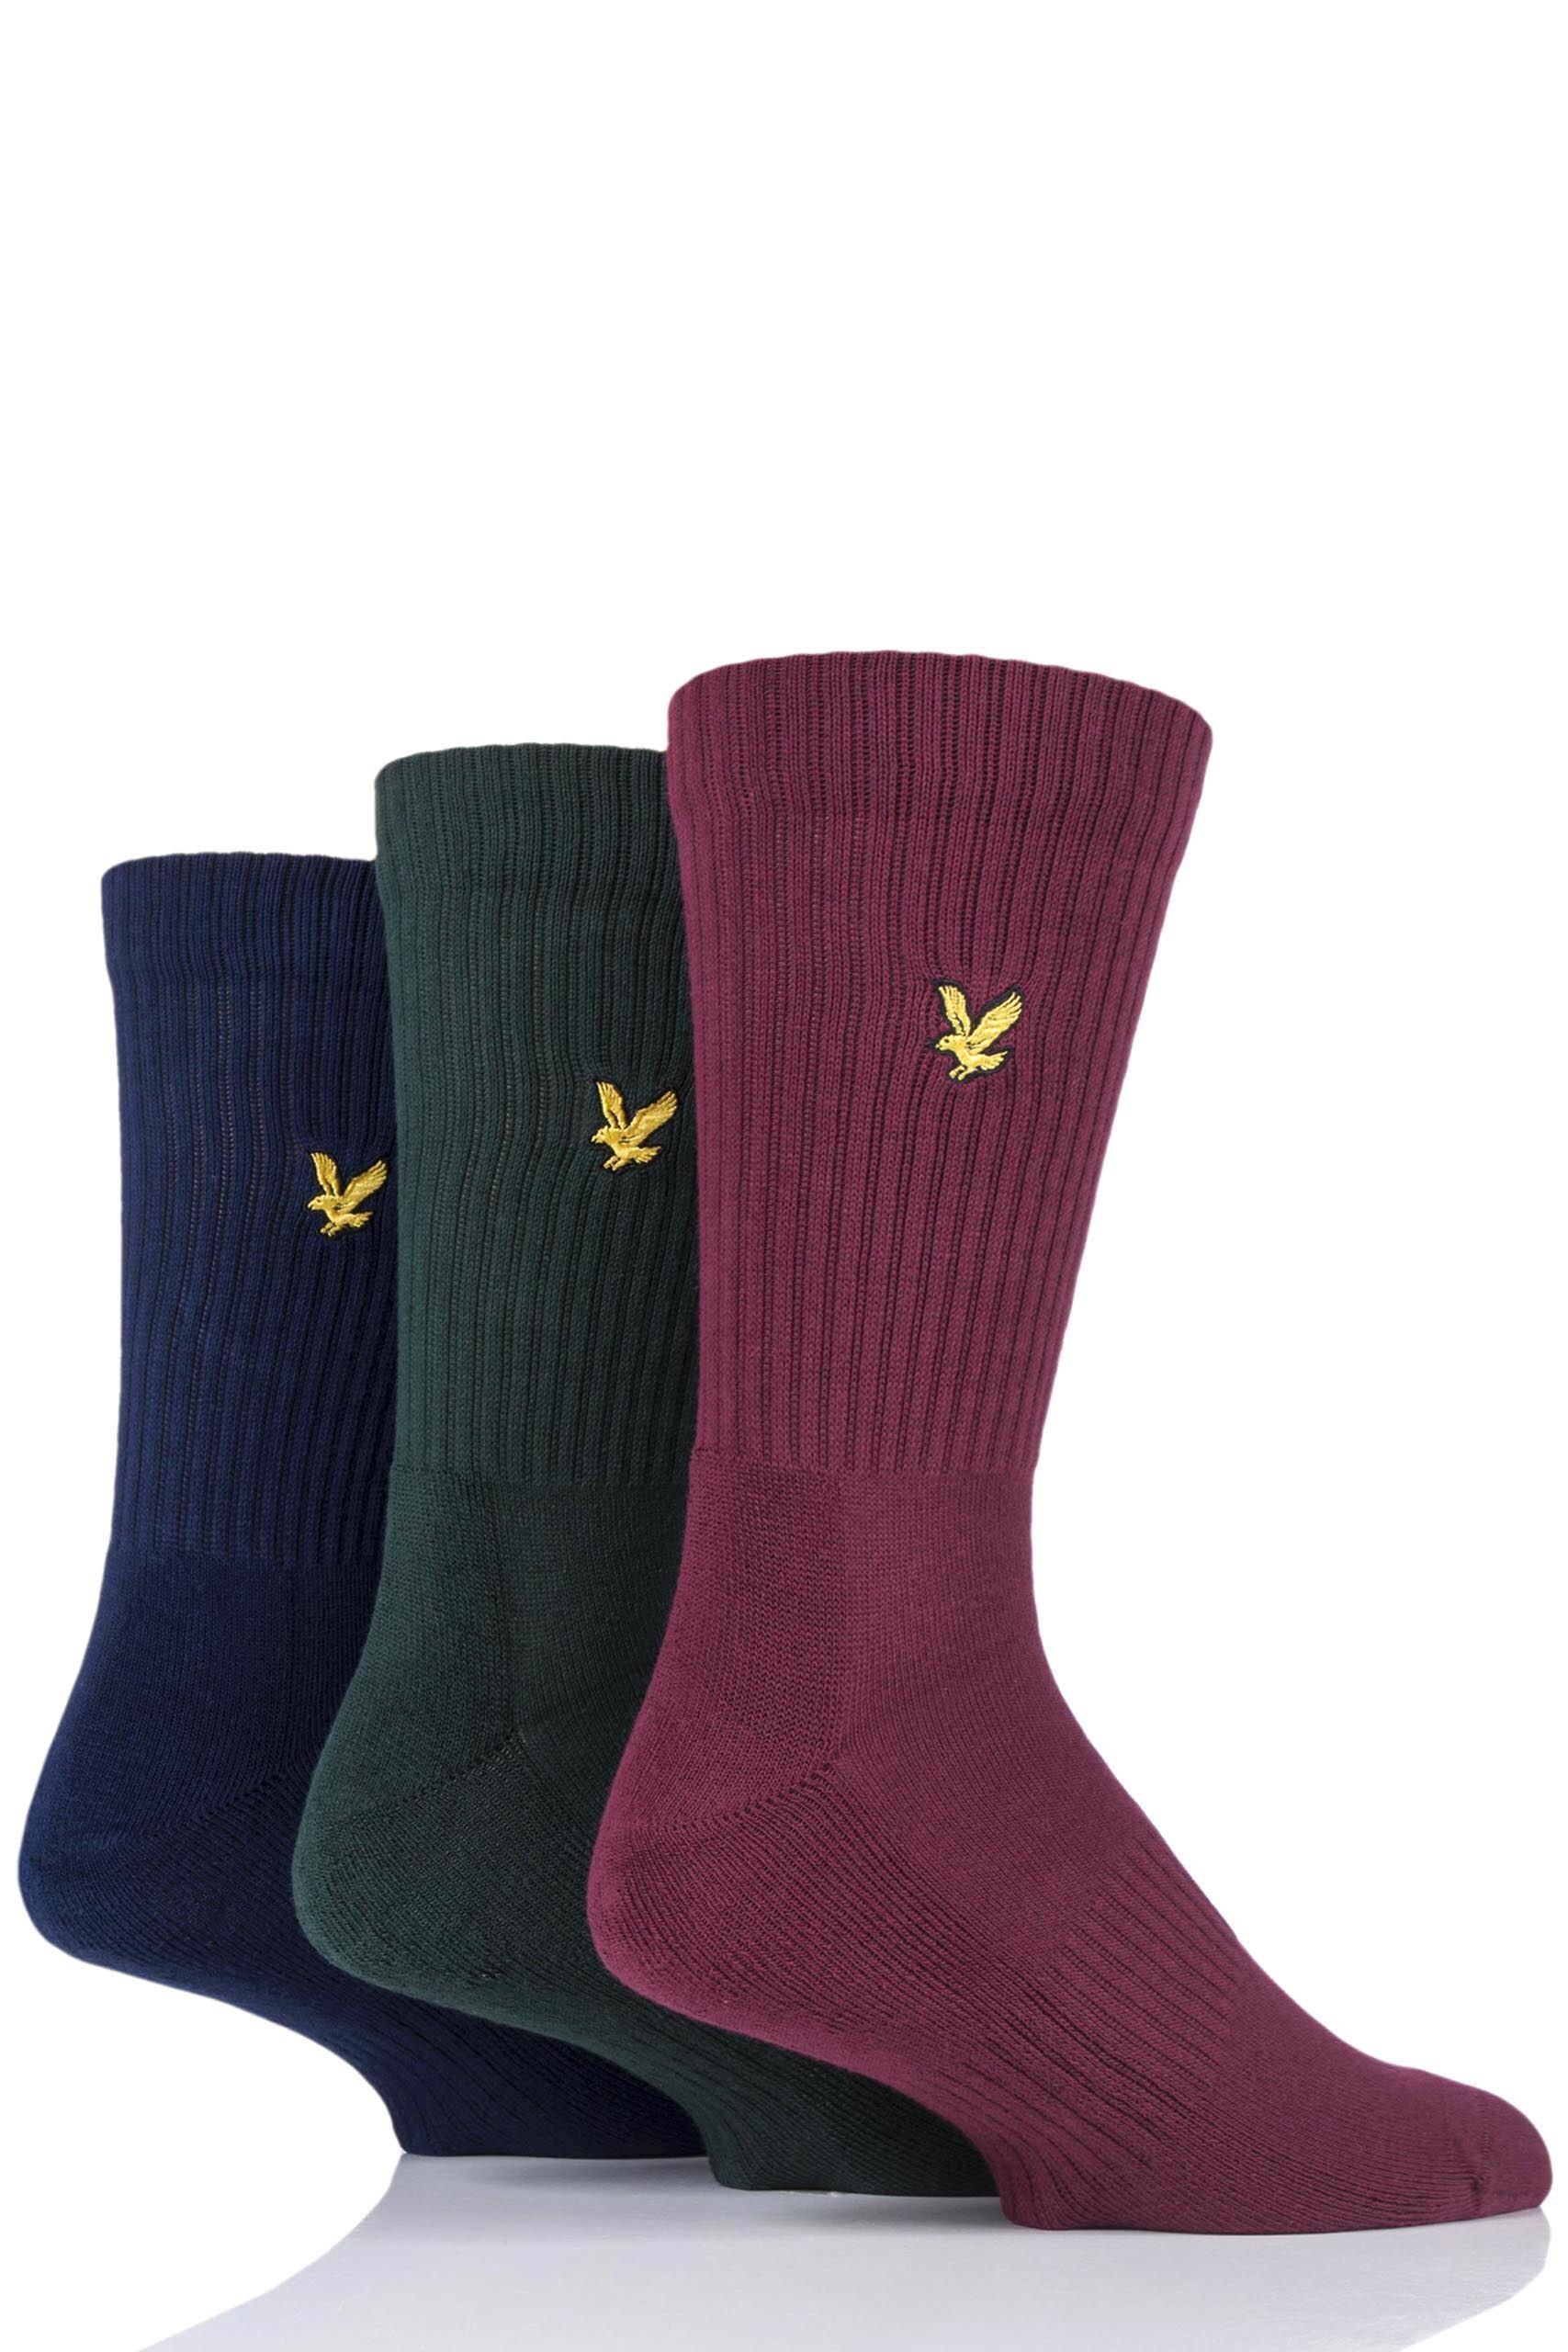 Image of 3 Pair Pine Hamilton Plain Cotton Sports Socks Men's 7-11 Mens - Lyle & Scott